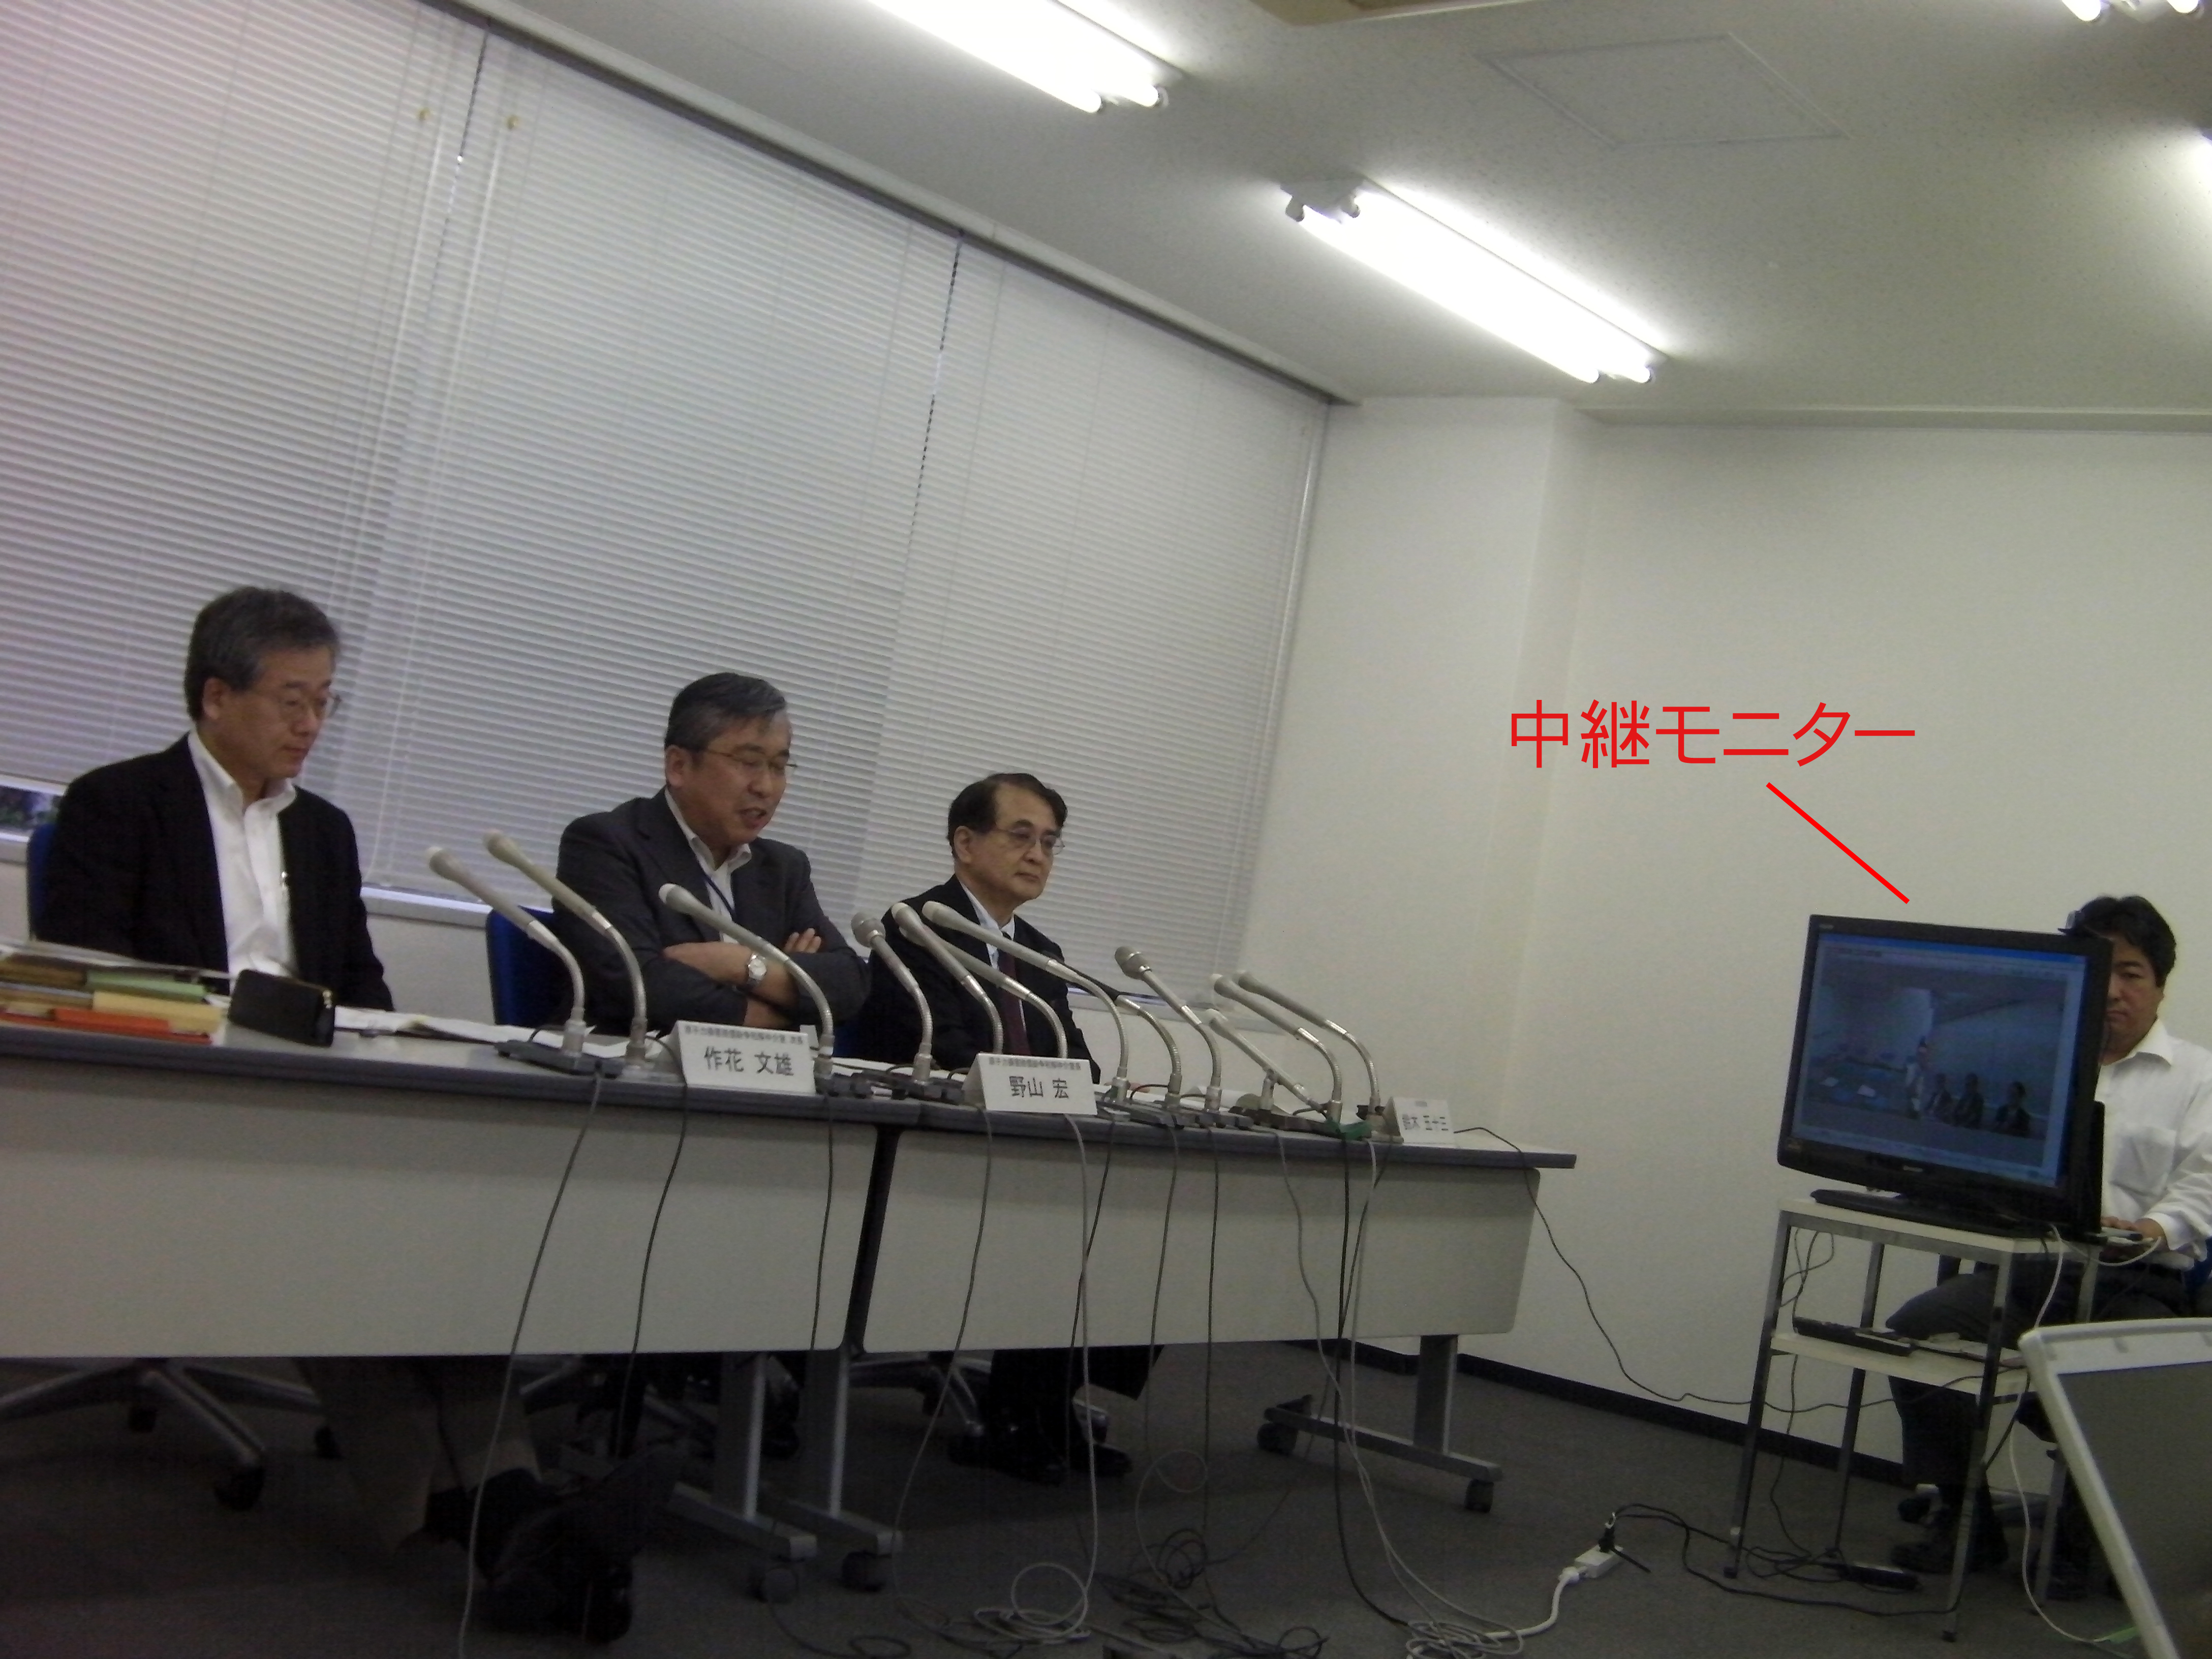 http://daily.magazine9.jp/m9/oshidori/SANY25.jpg